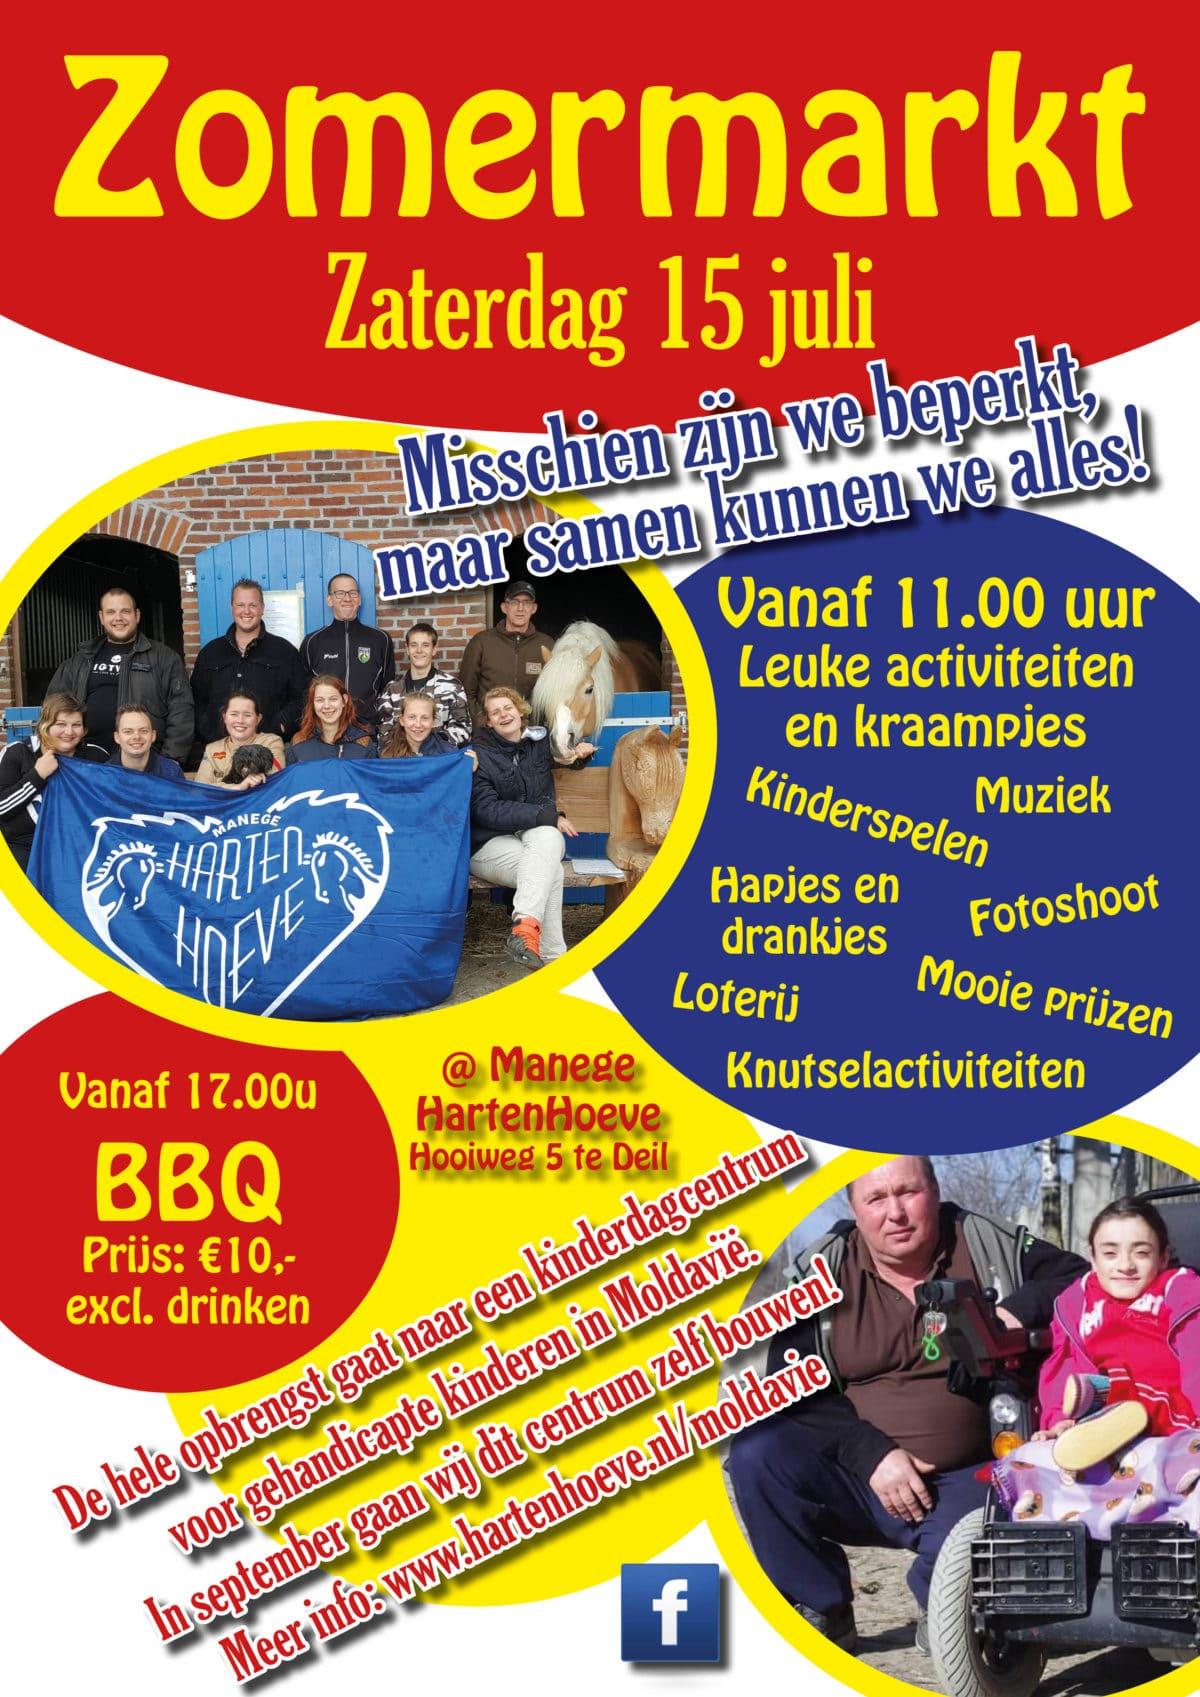 moldavie 15 juli zomermarkt